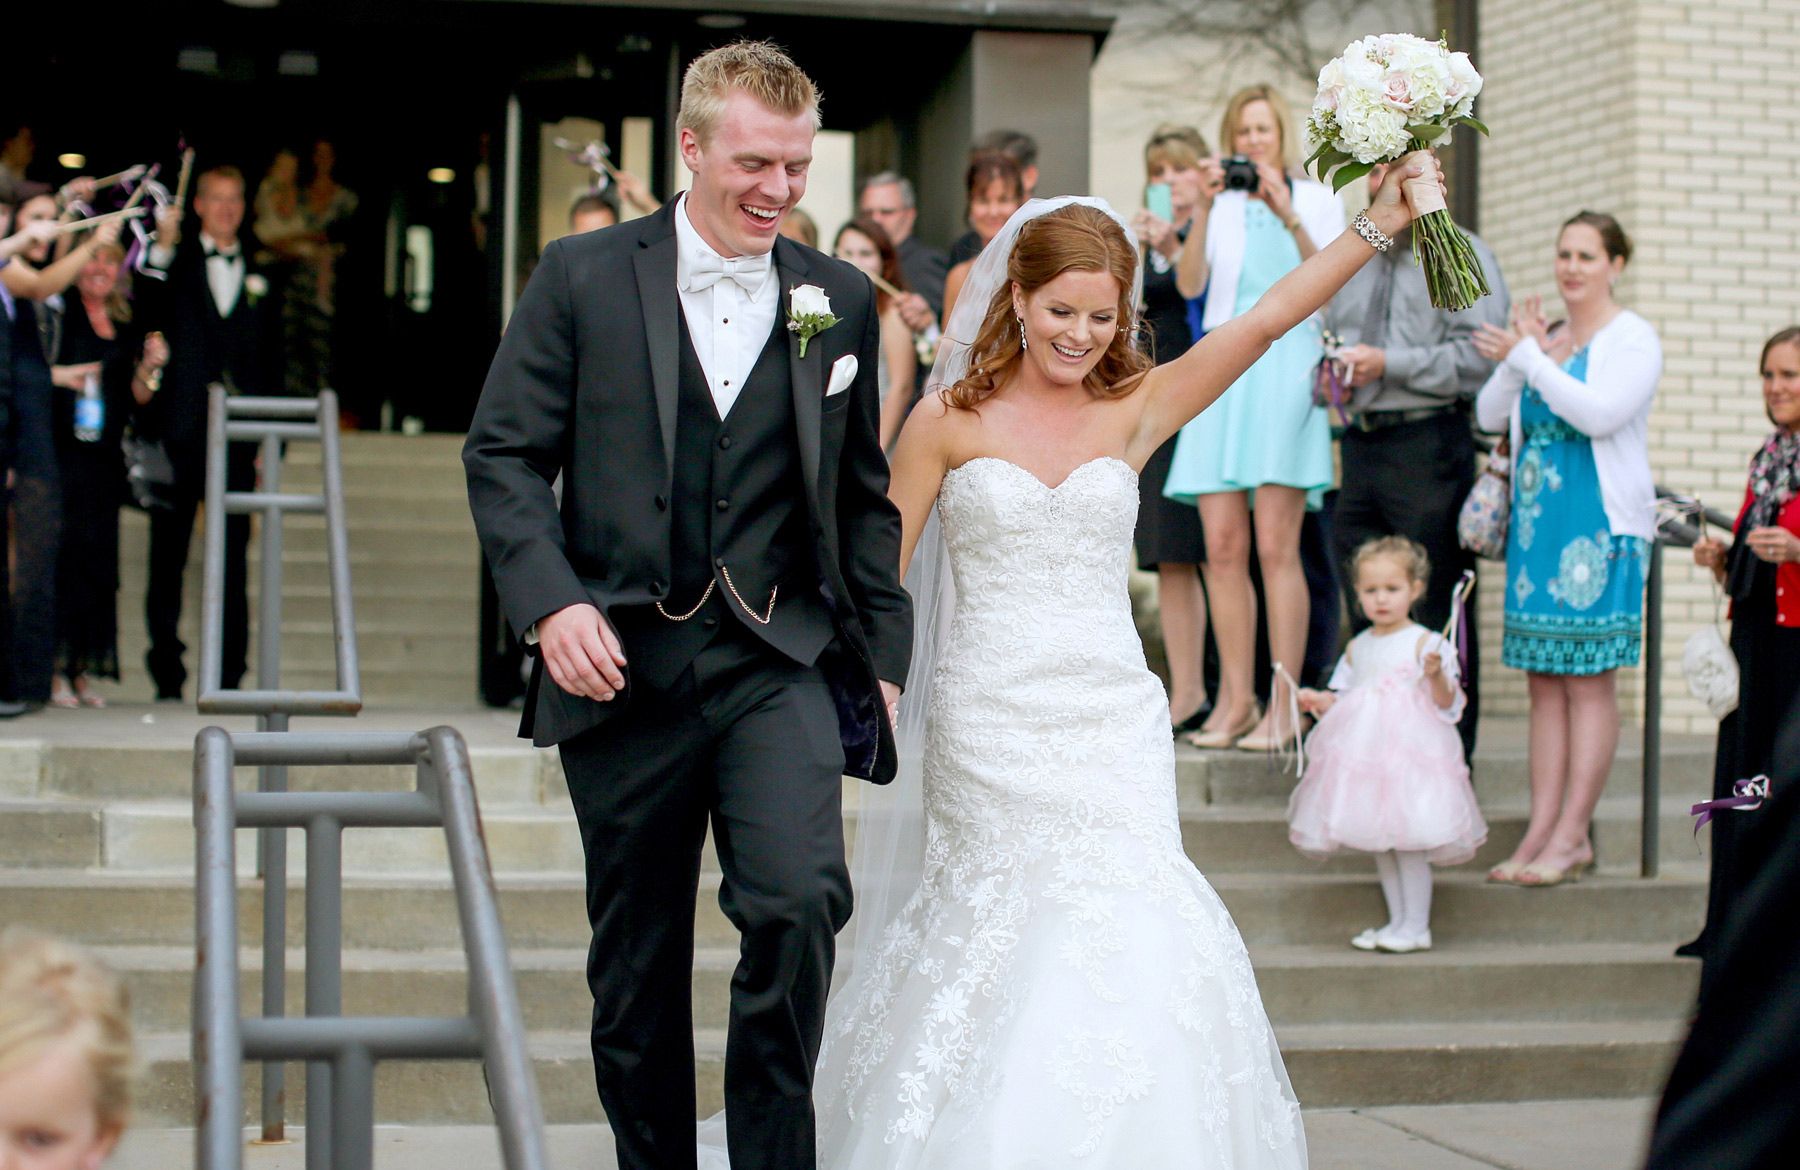 10-Minneapolis-Minnesota-Wedding-Photography-by-Vick-Photography-Ceremony-Woodbury-Lutheran-Church-Tianna-&-Matt.jpg